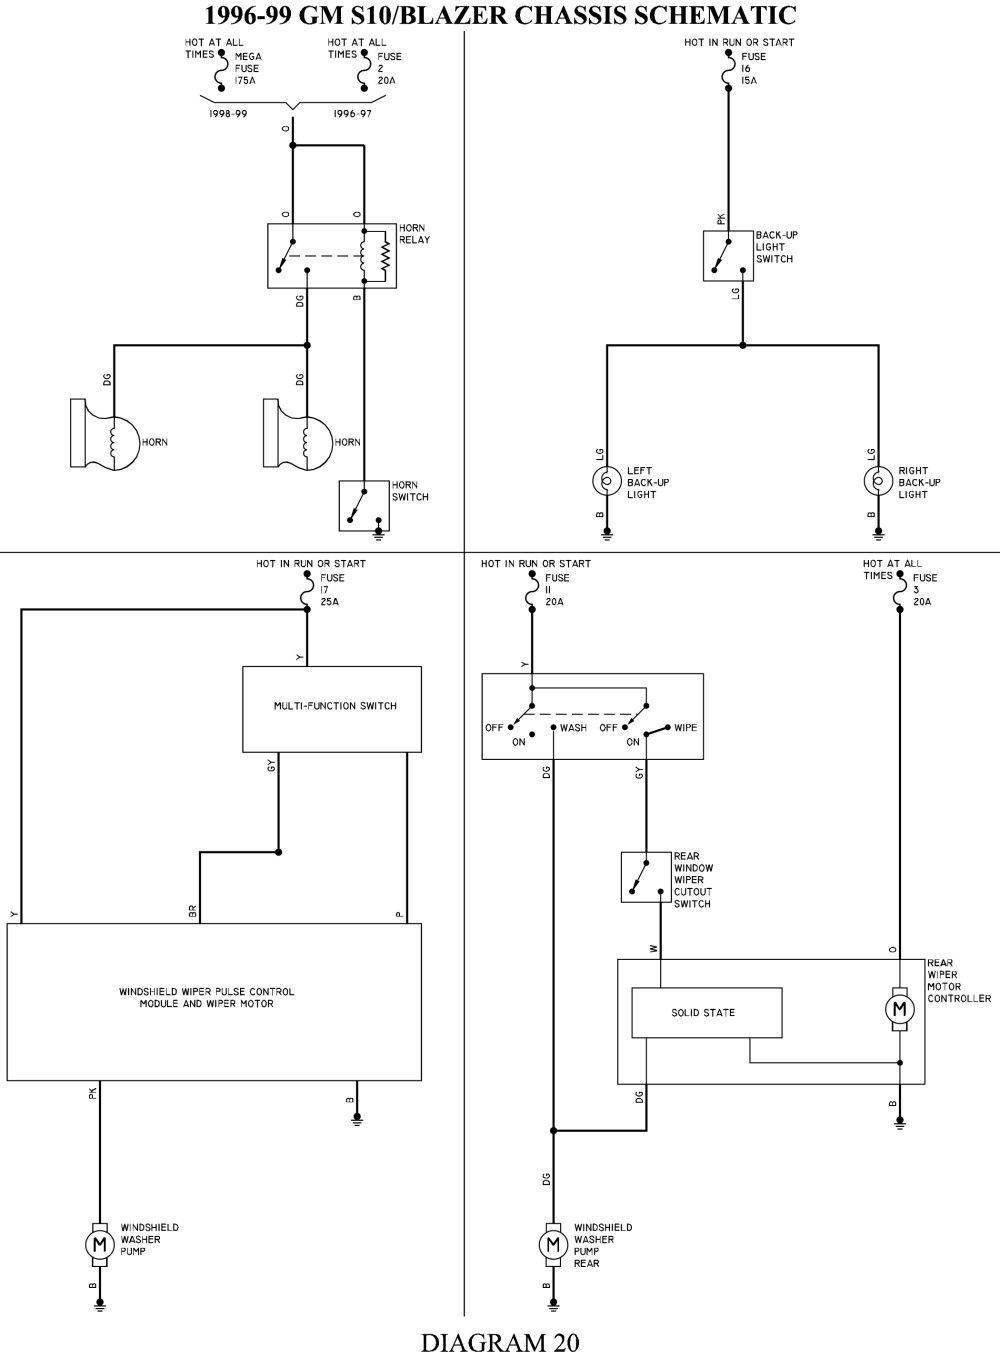 Awesome 2000 S10 Headlight Wiring Diagram di 2020 | 99 S10 Headlight Wiring Diagram |  | Pinterest